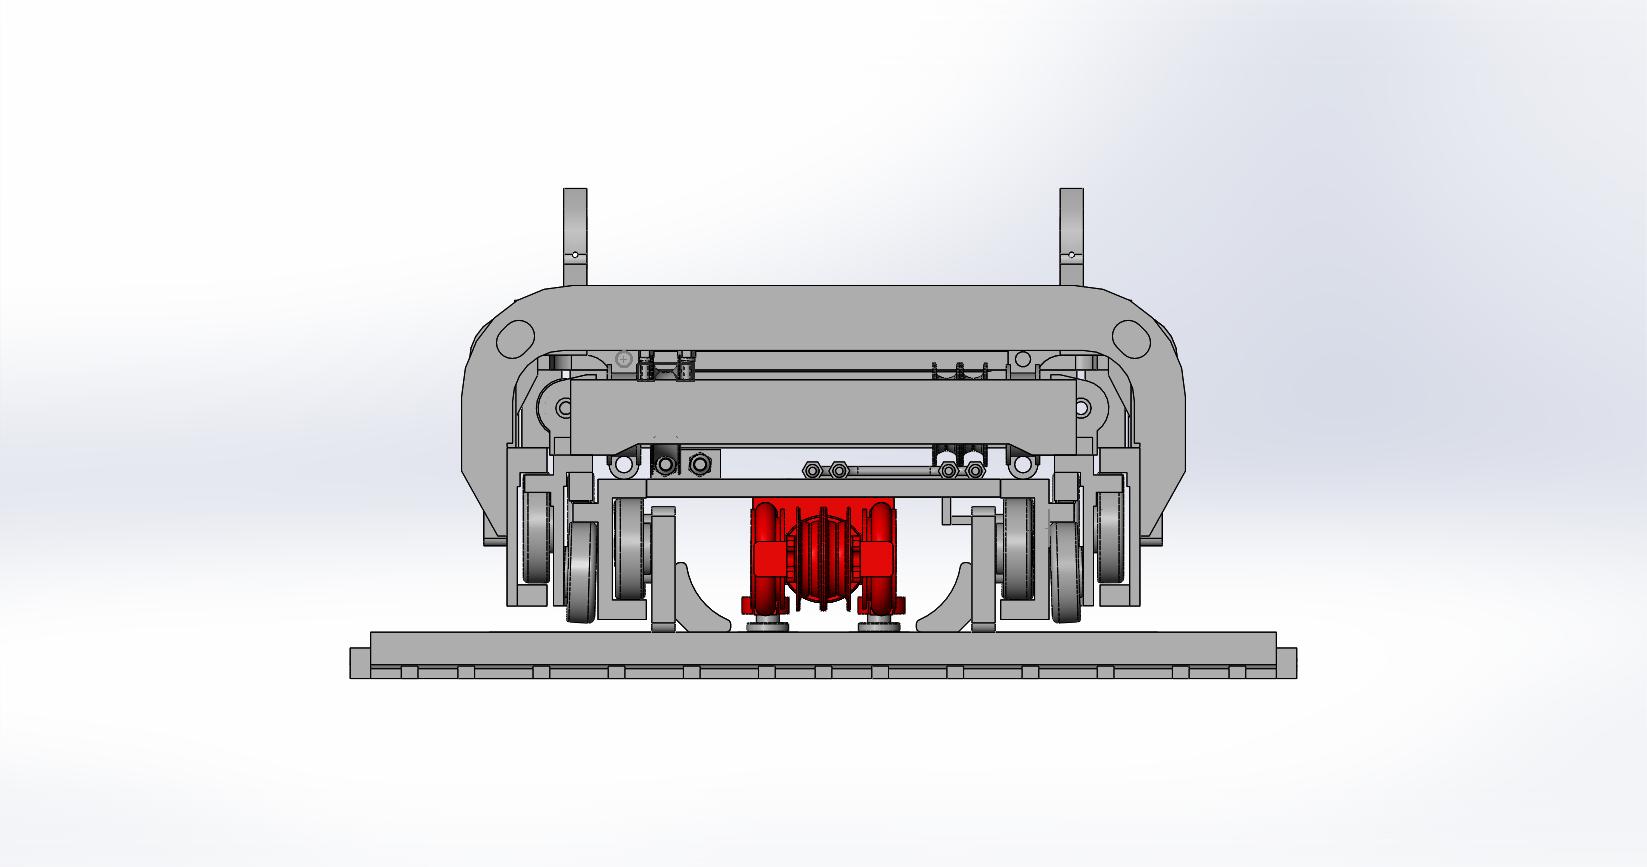 Axon Forklift: Three Stage Mast-1